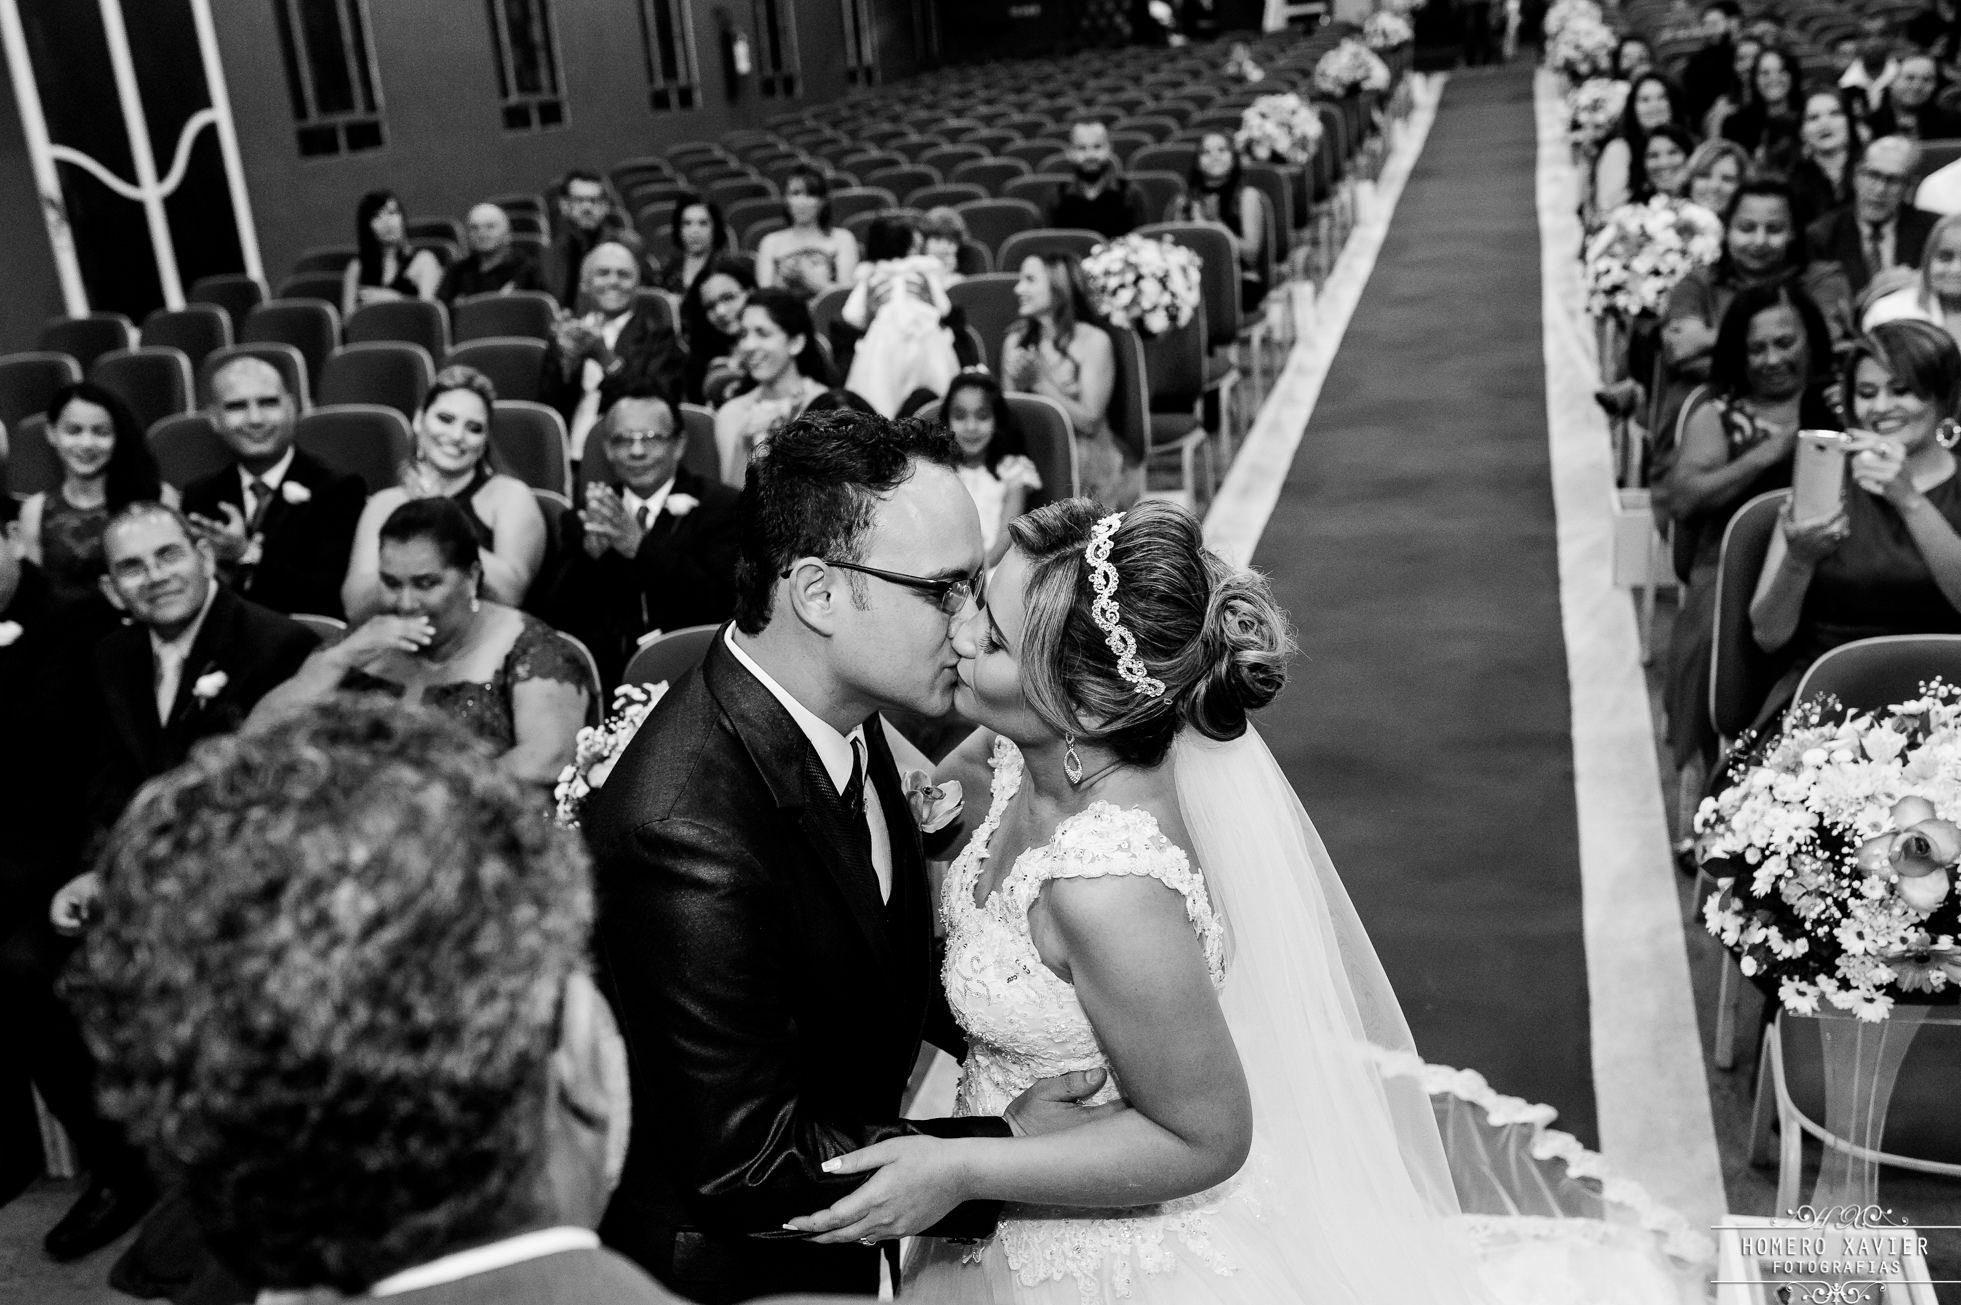 fotos casamento Igreja Batista da Pampulha BHfotos casamento Igreja Batista da Pampulha BH